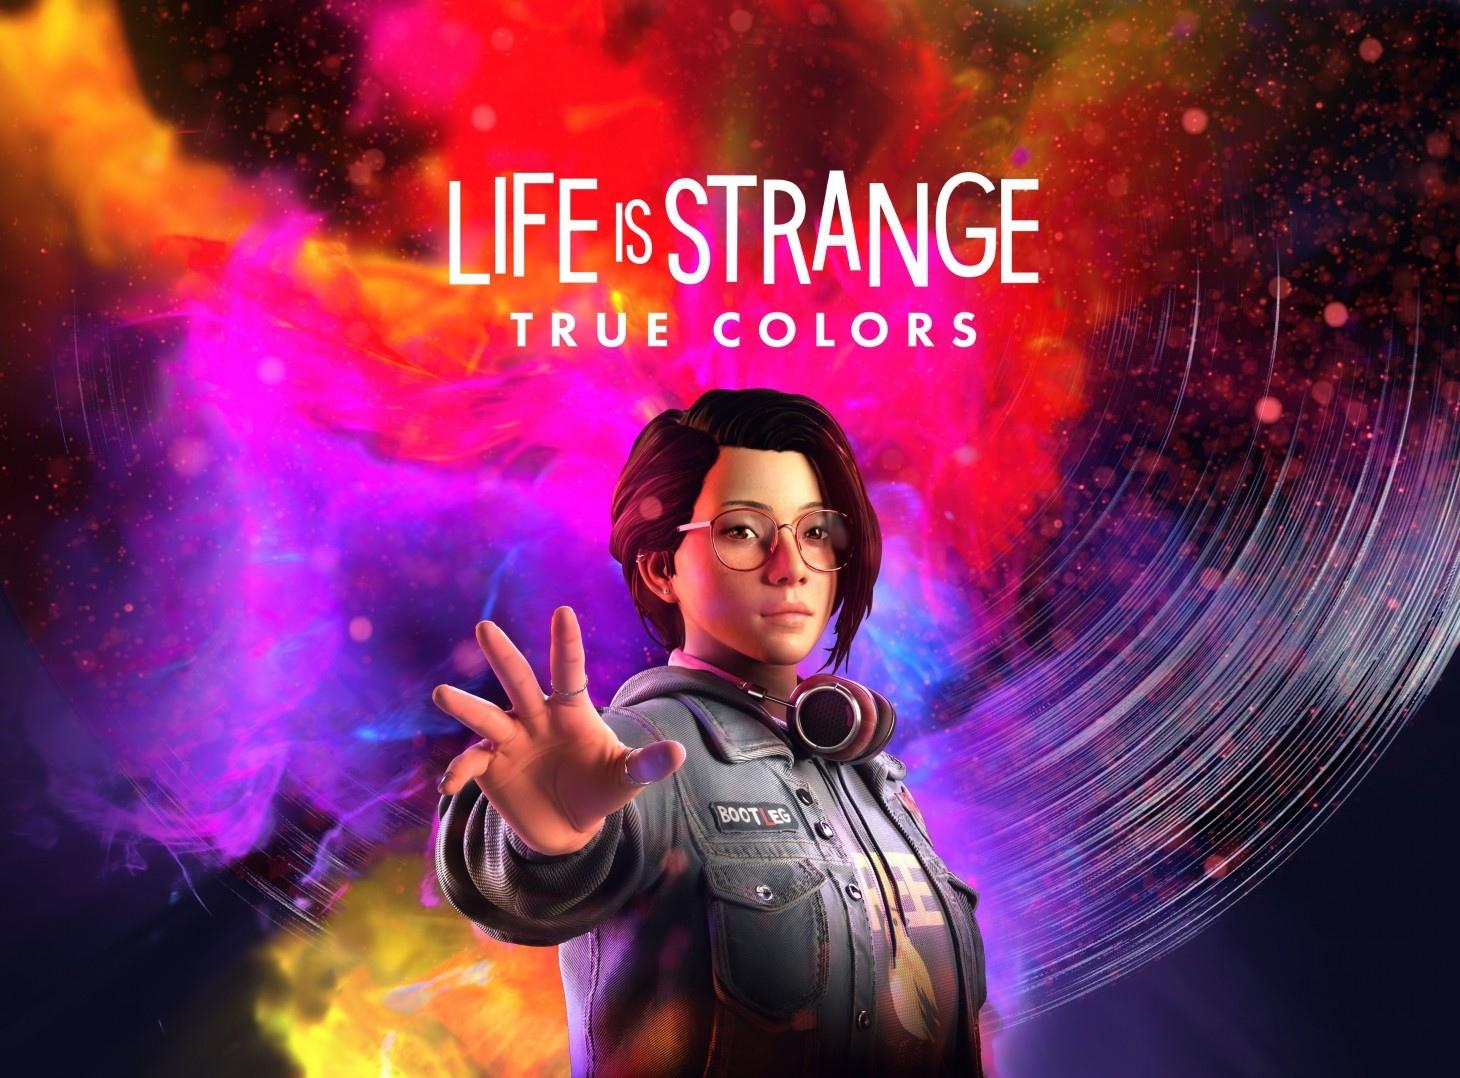 Детали и дата выхода Life is Strange: True Colors